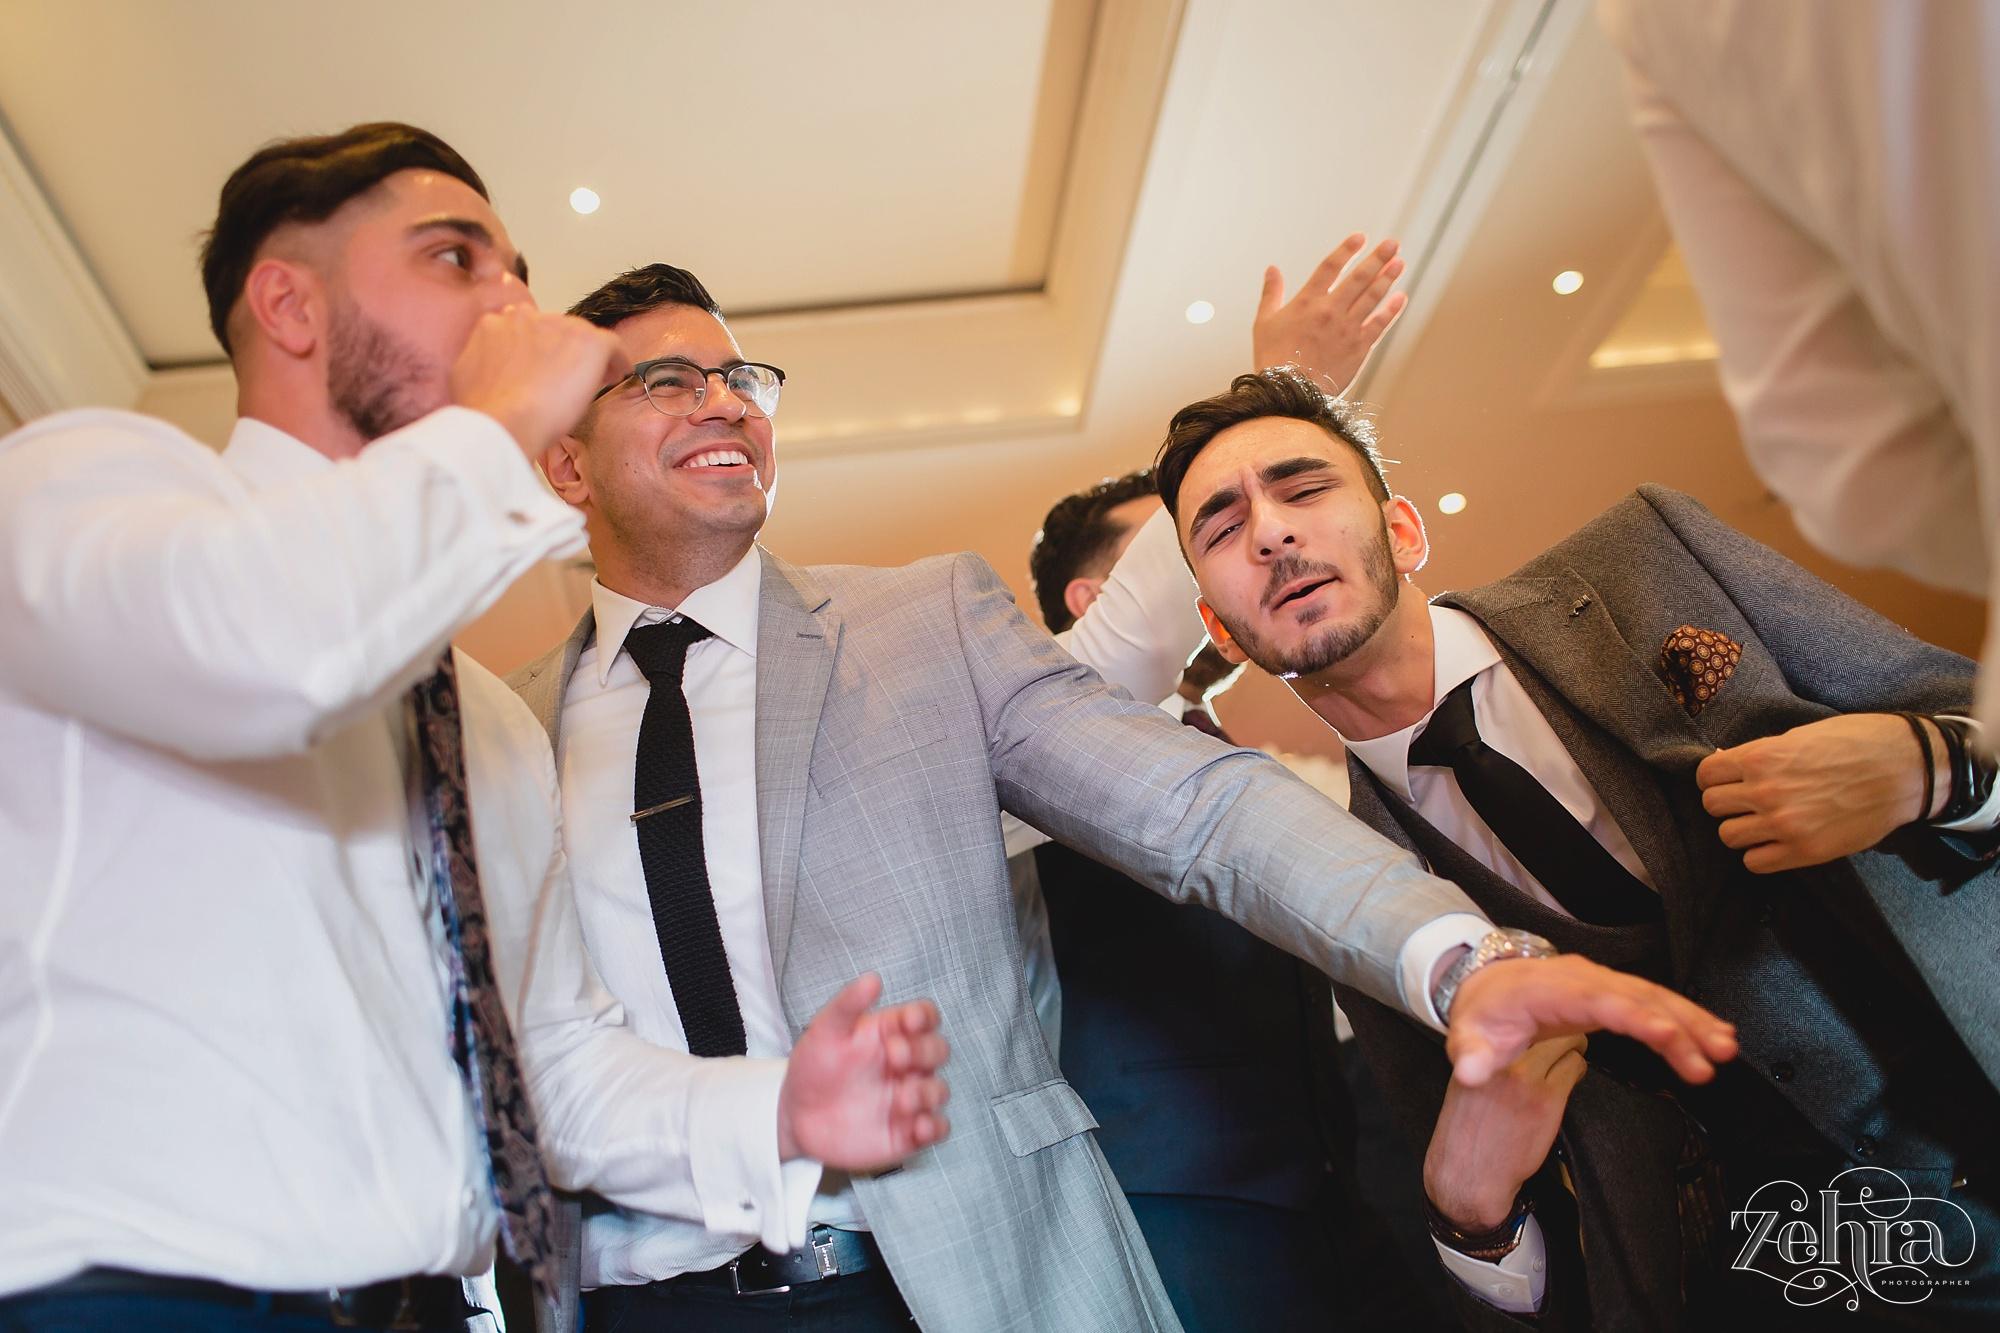 zehra photographer mere cheshire wedding_0050.jpg